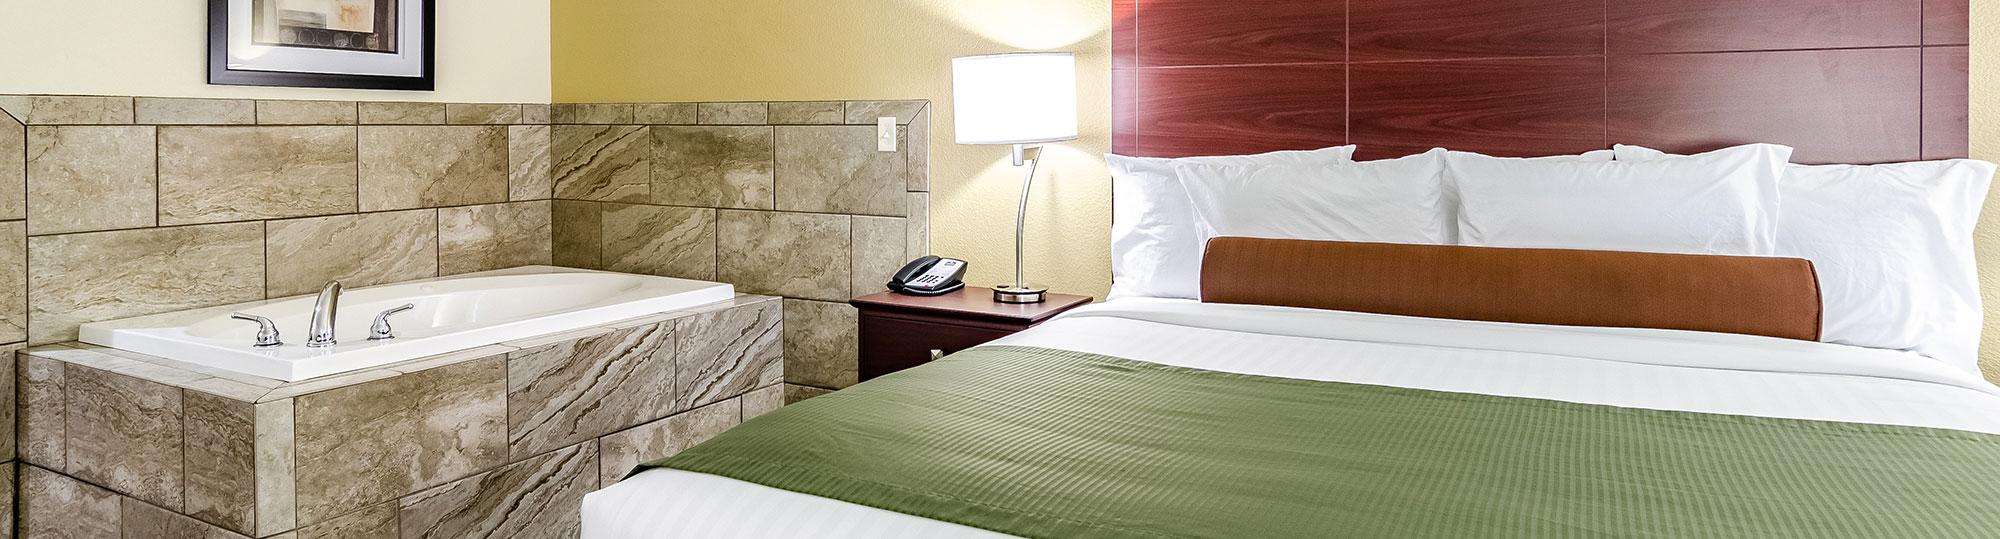 Cobblestone Hotel and Suites Gering